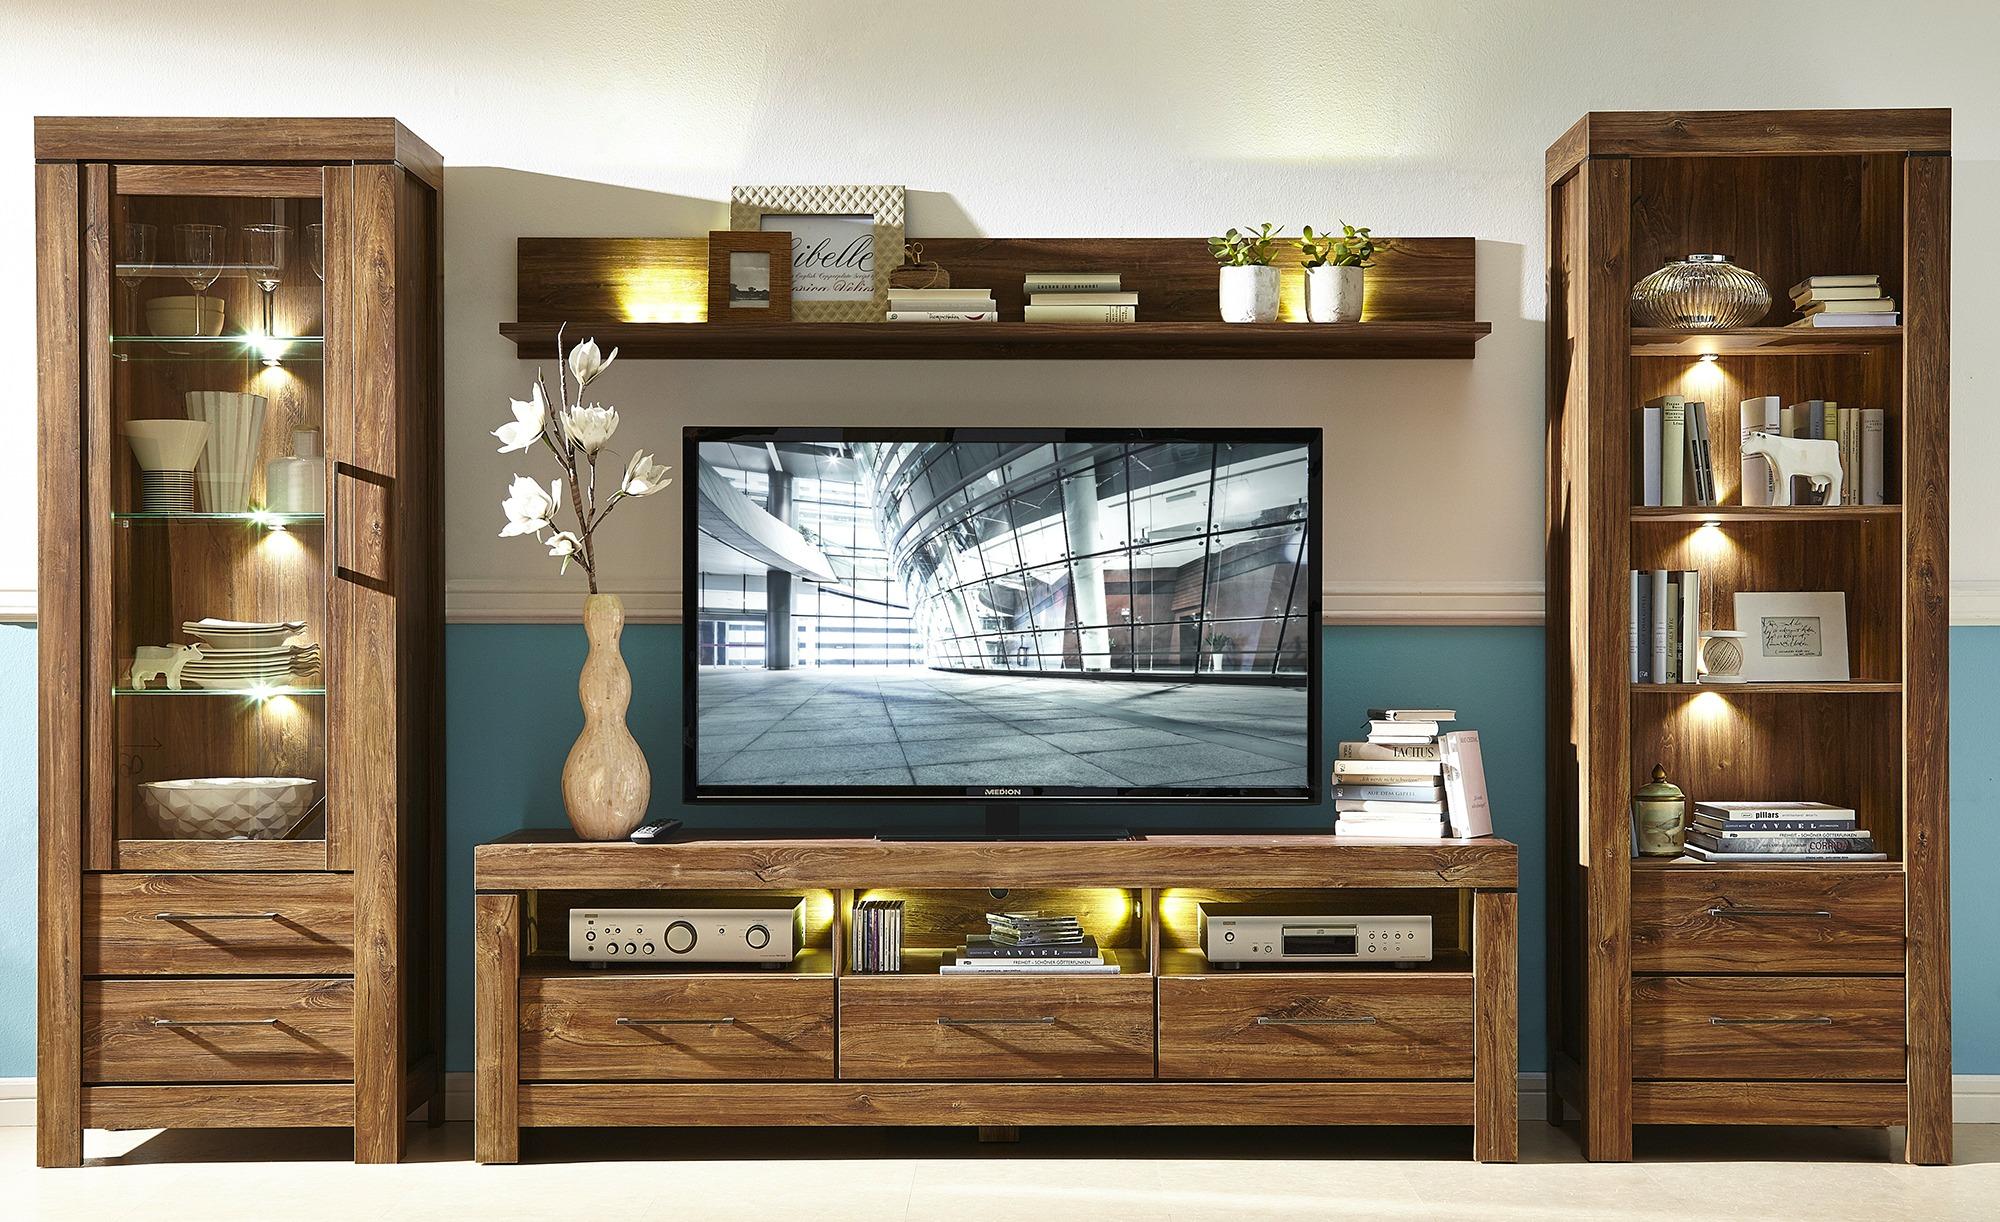 TV-Lowboard  Rubino ¦ holzfarben ¦ Maße (cm): B: 200 H: 60 T: 54 Kommoden & Sideboards > Lowboards - Höffner